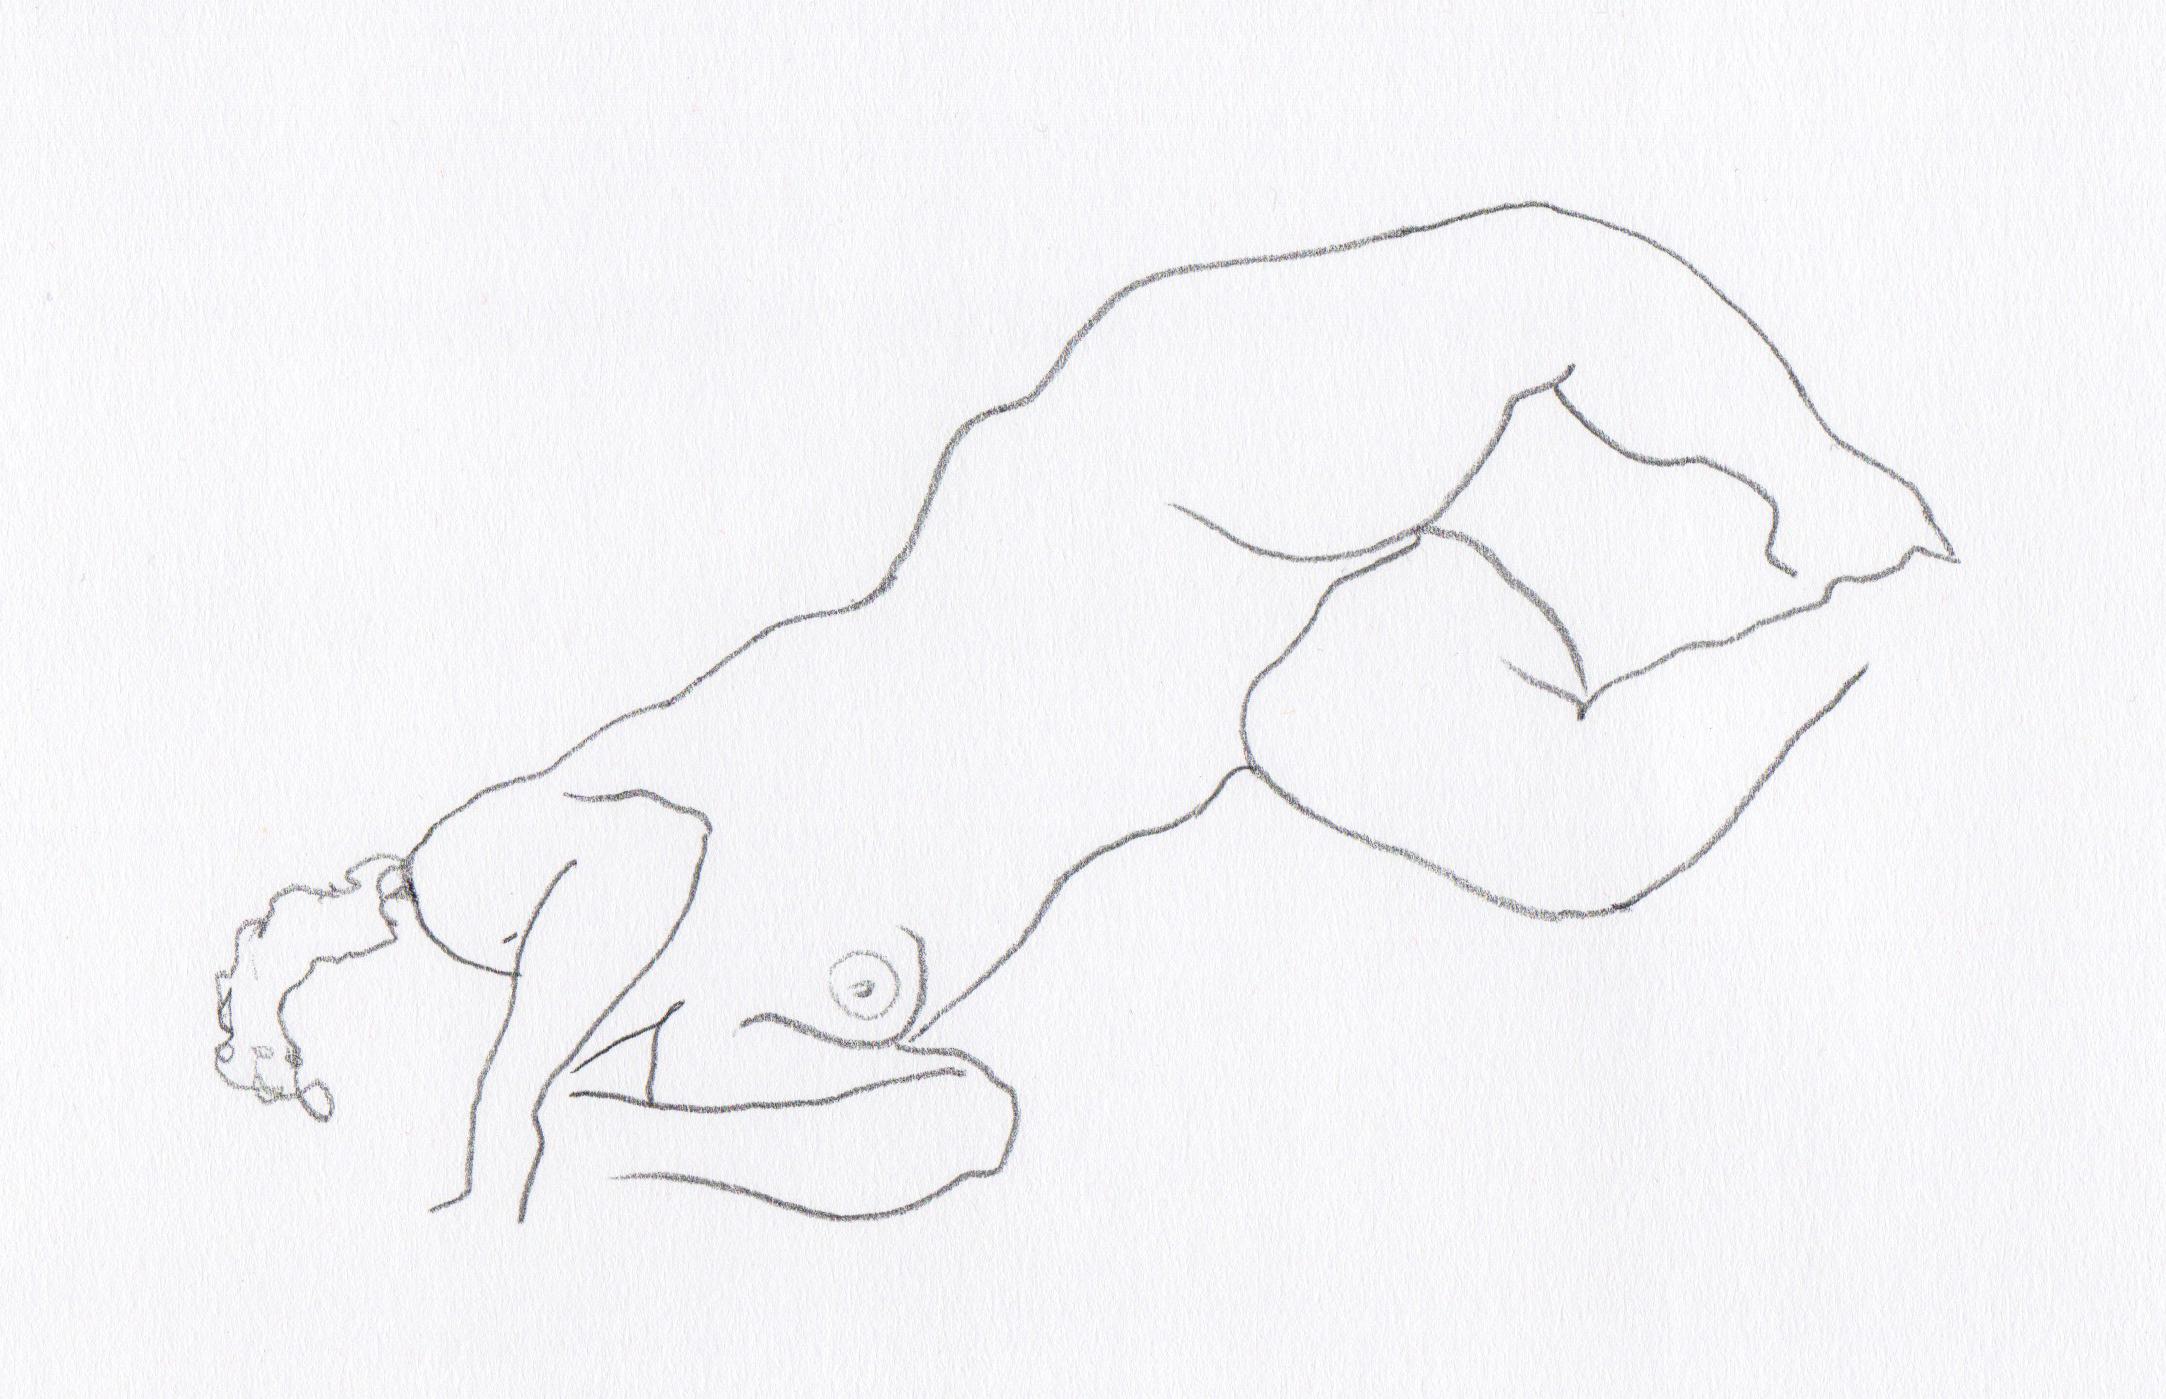 2012_Sketch_F-Beudin_003